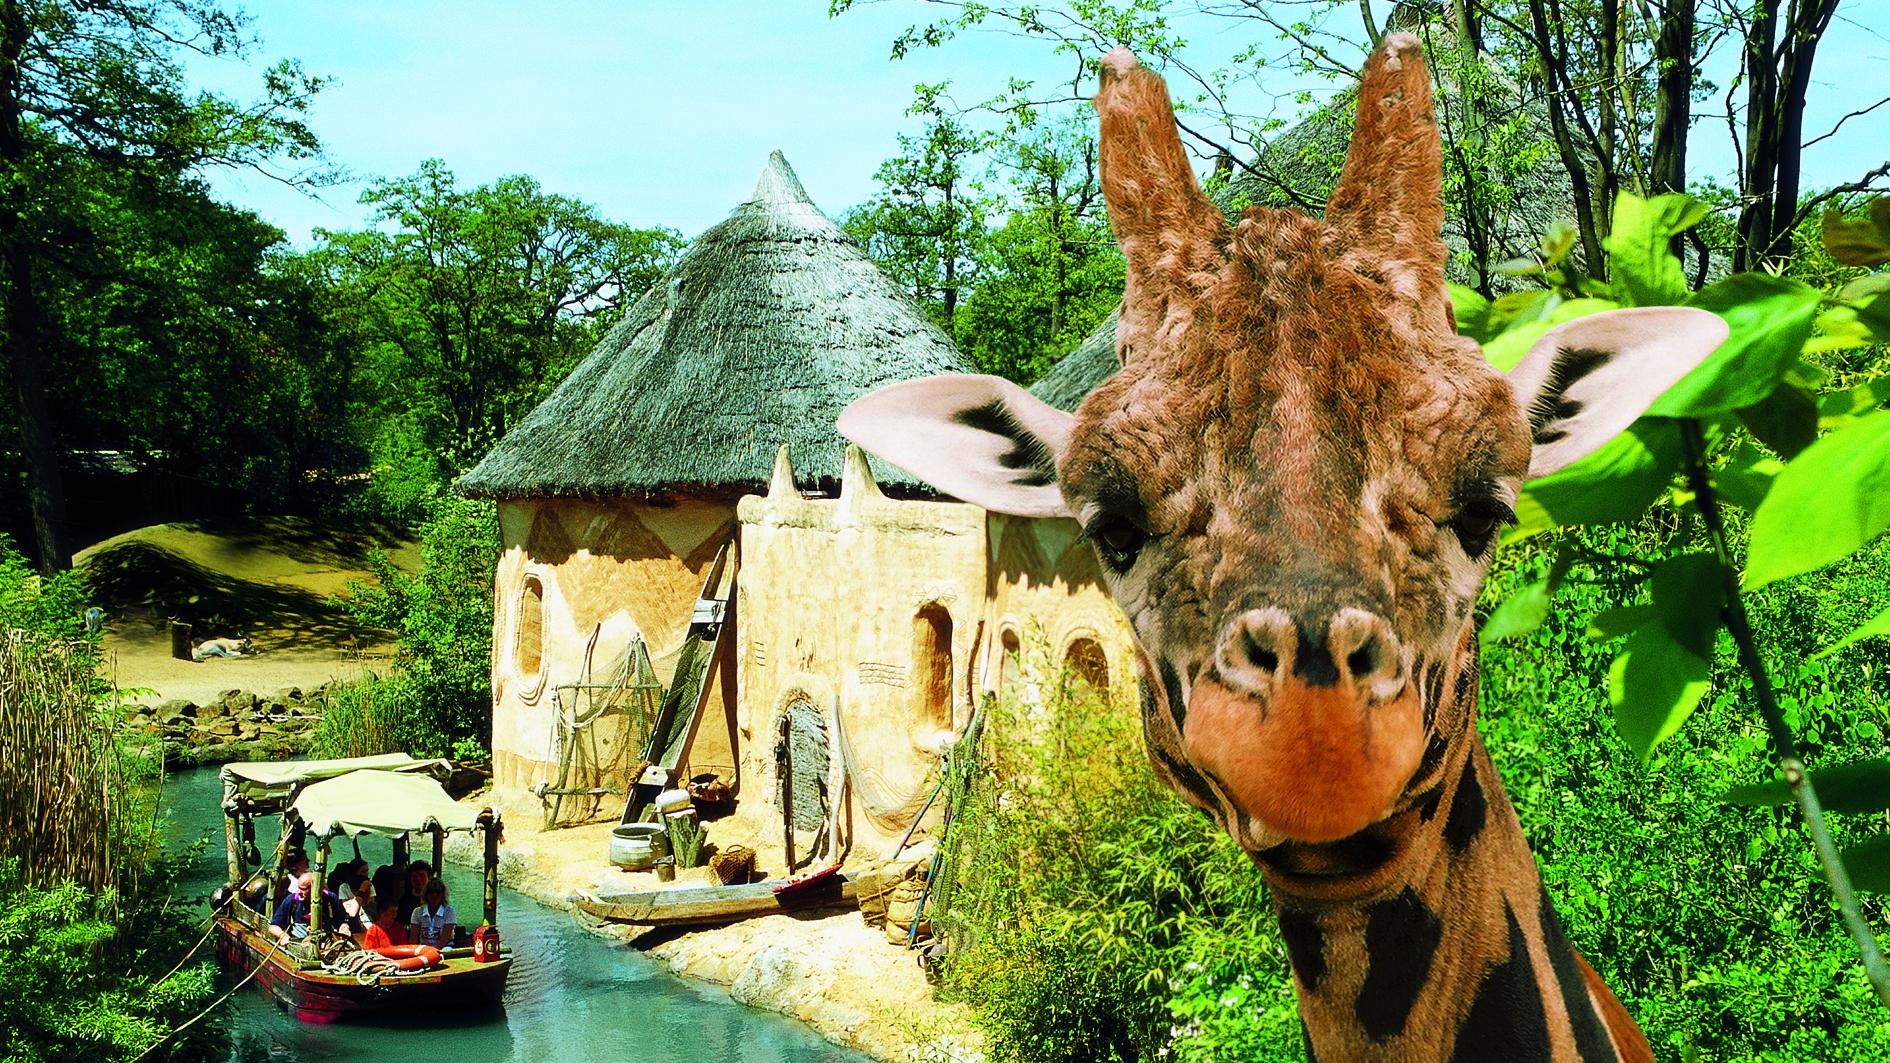 erlebnis-zoo-hannover-sambesi-giraffe-a